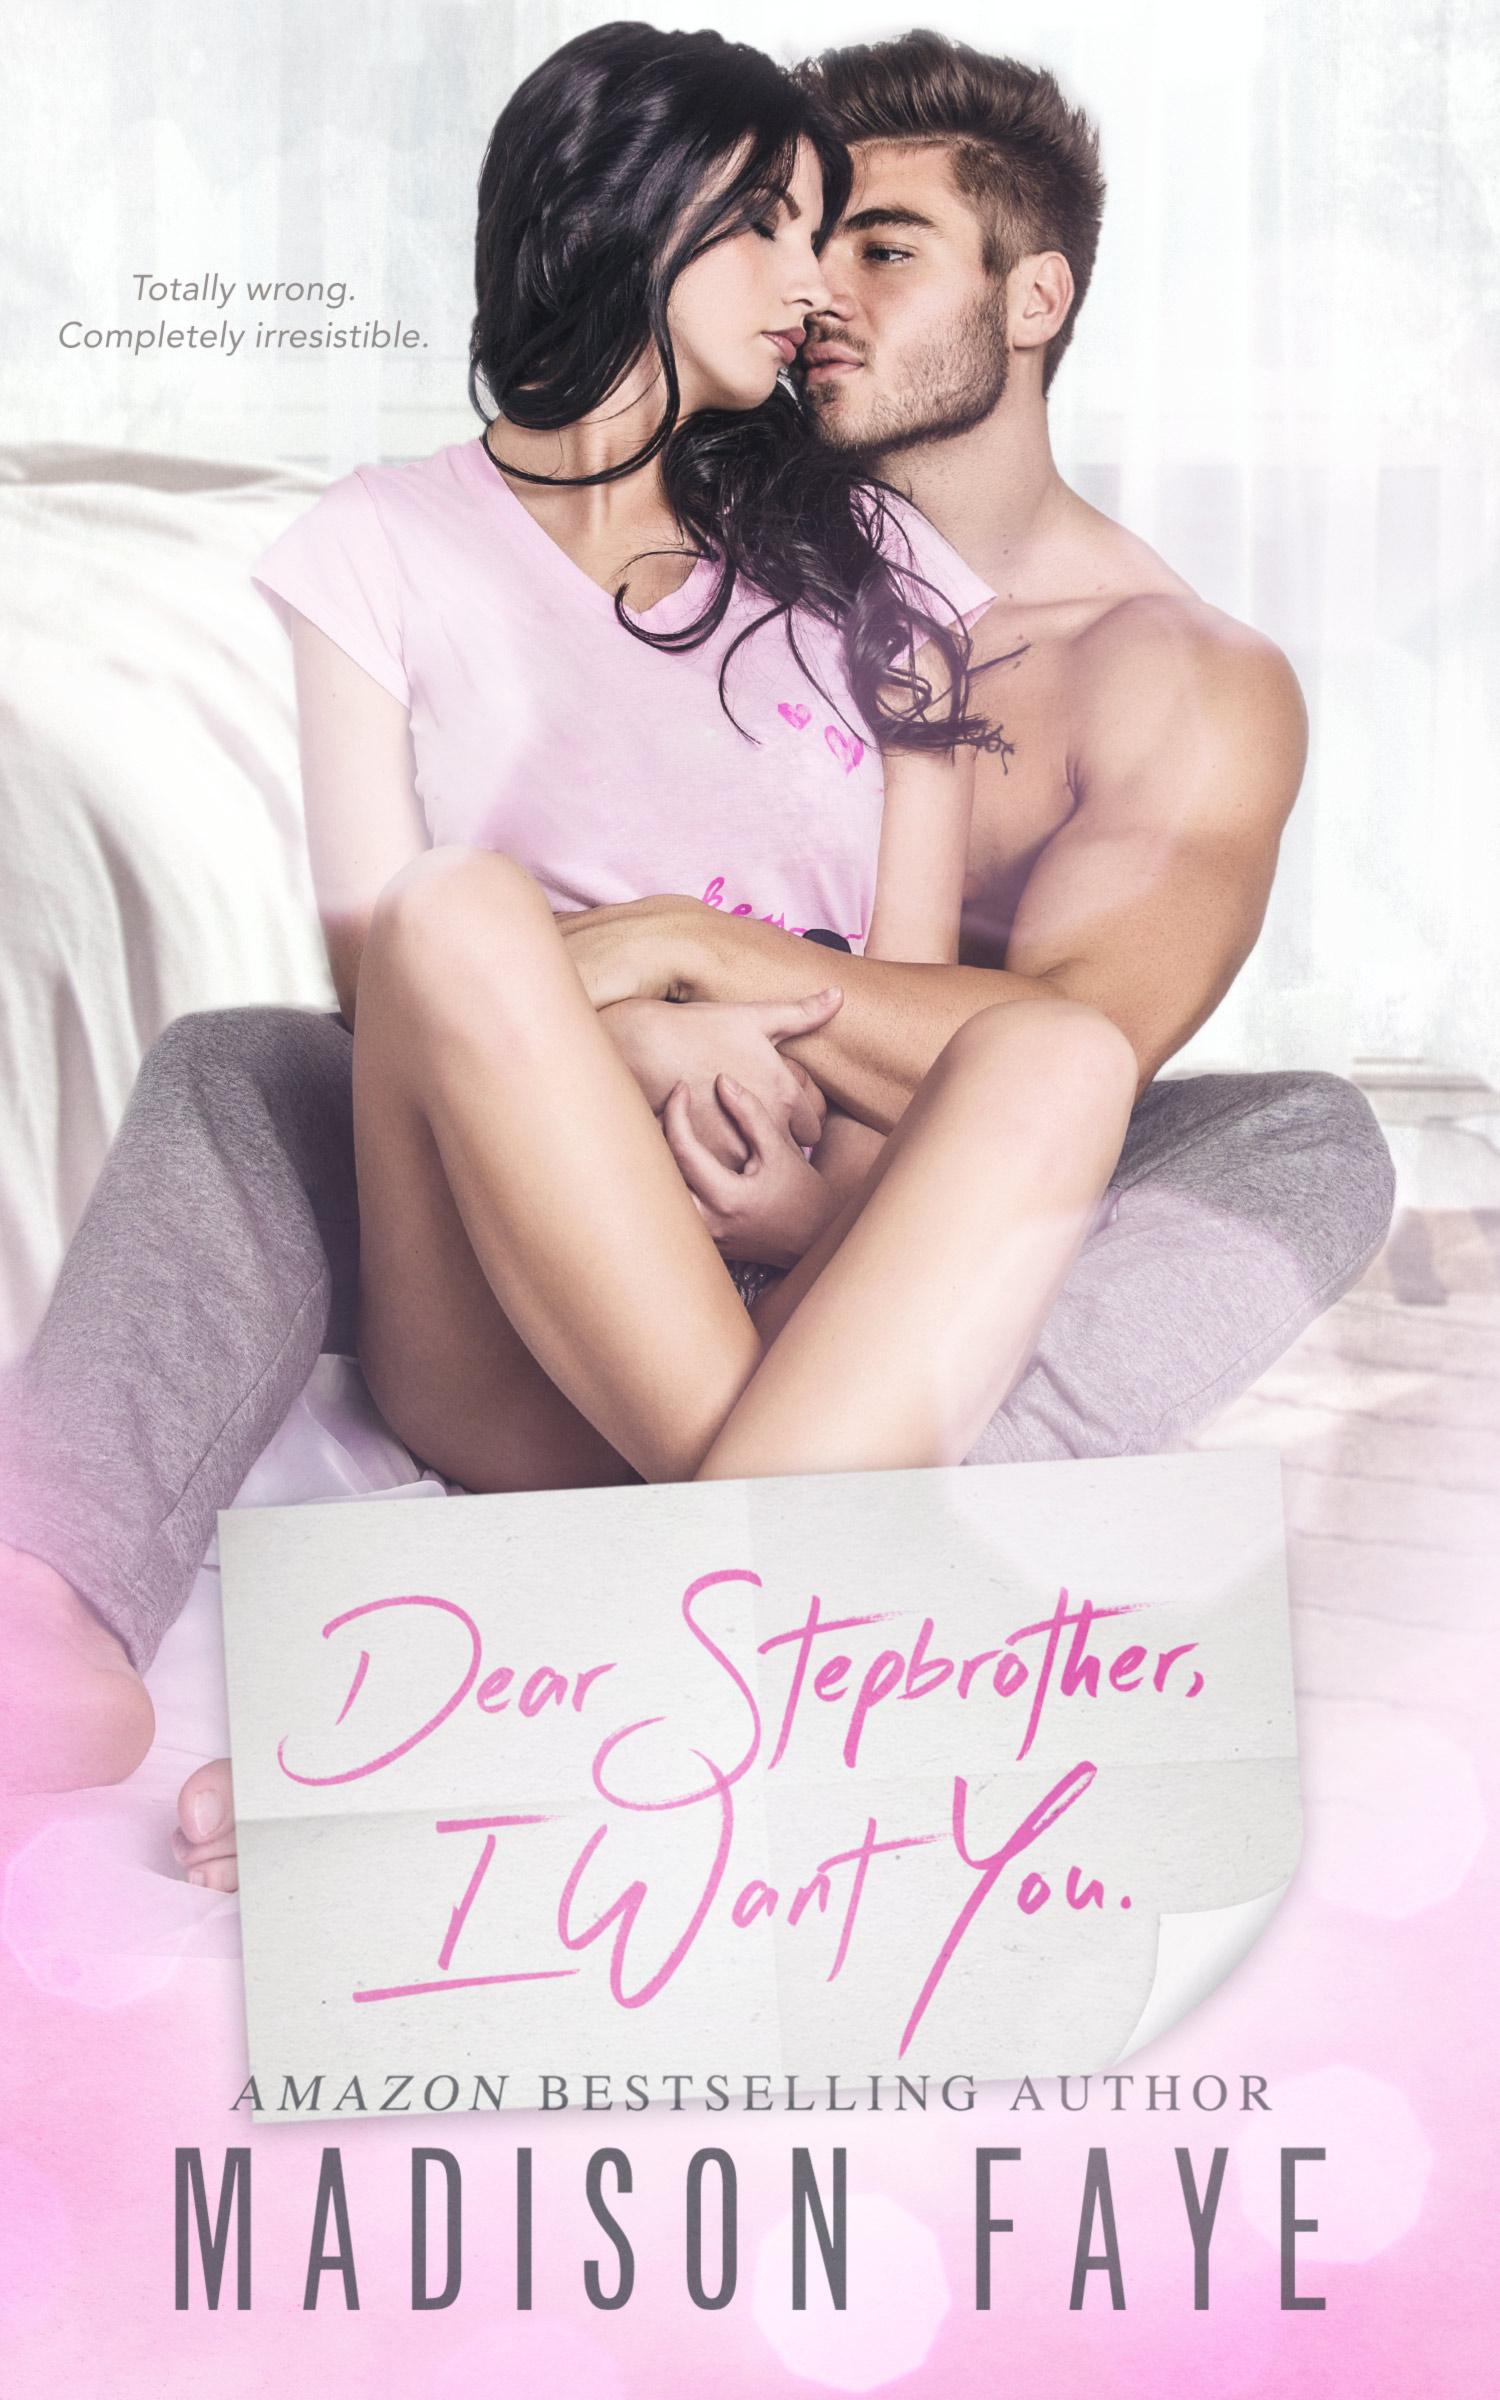 Dear-Stepbrother-I-Want-You-Kindle.jpg